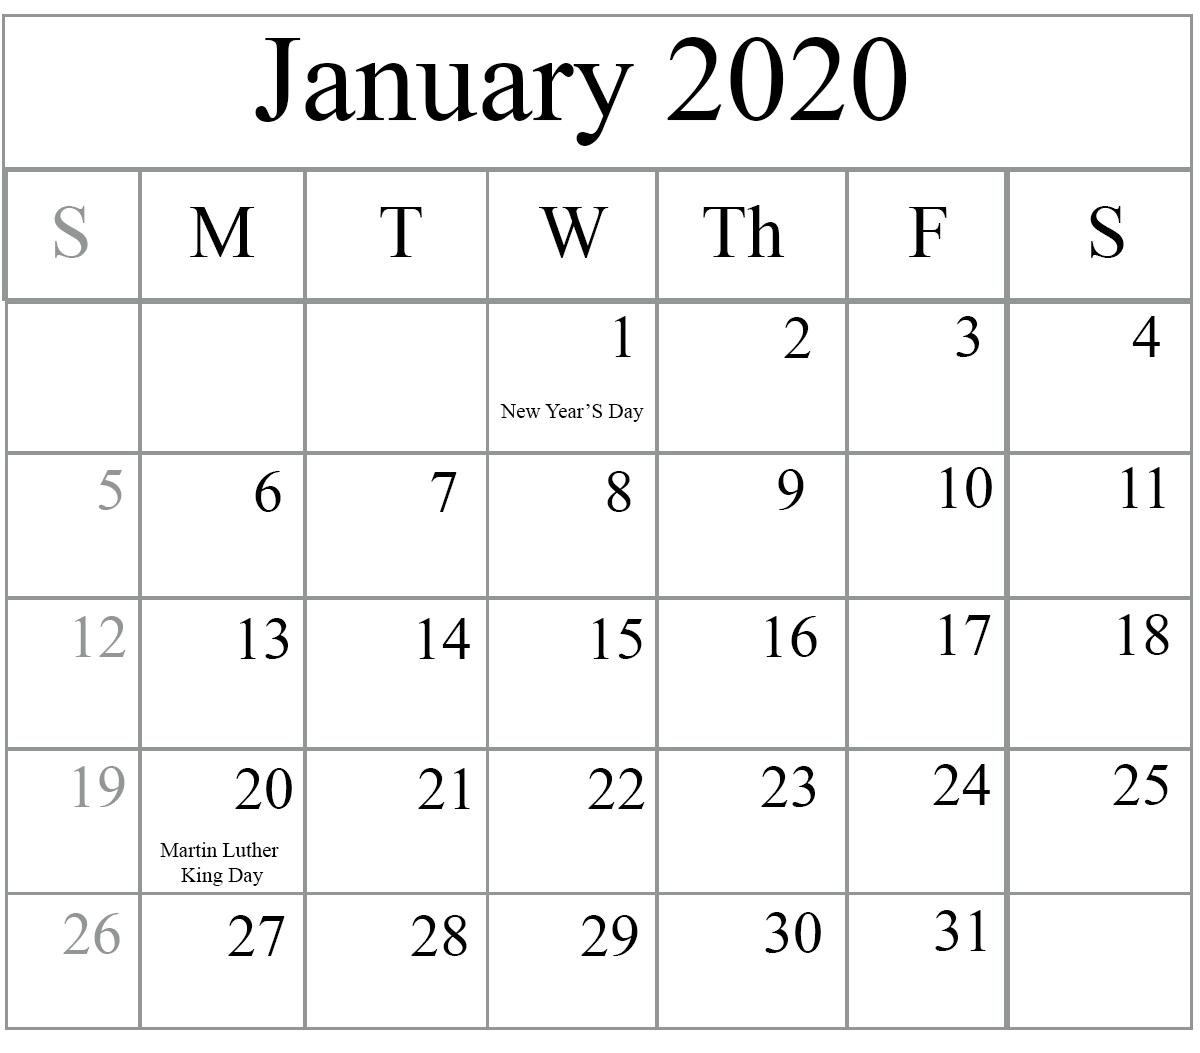 Free January 2020 Printable Calendar In Pdf, Excel & Word-January 2020 Calendar Events